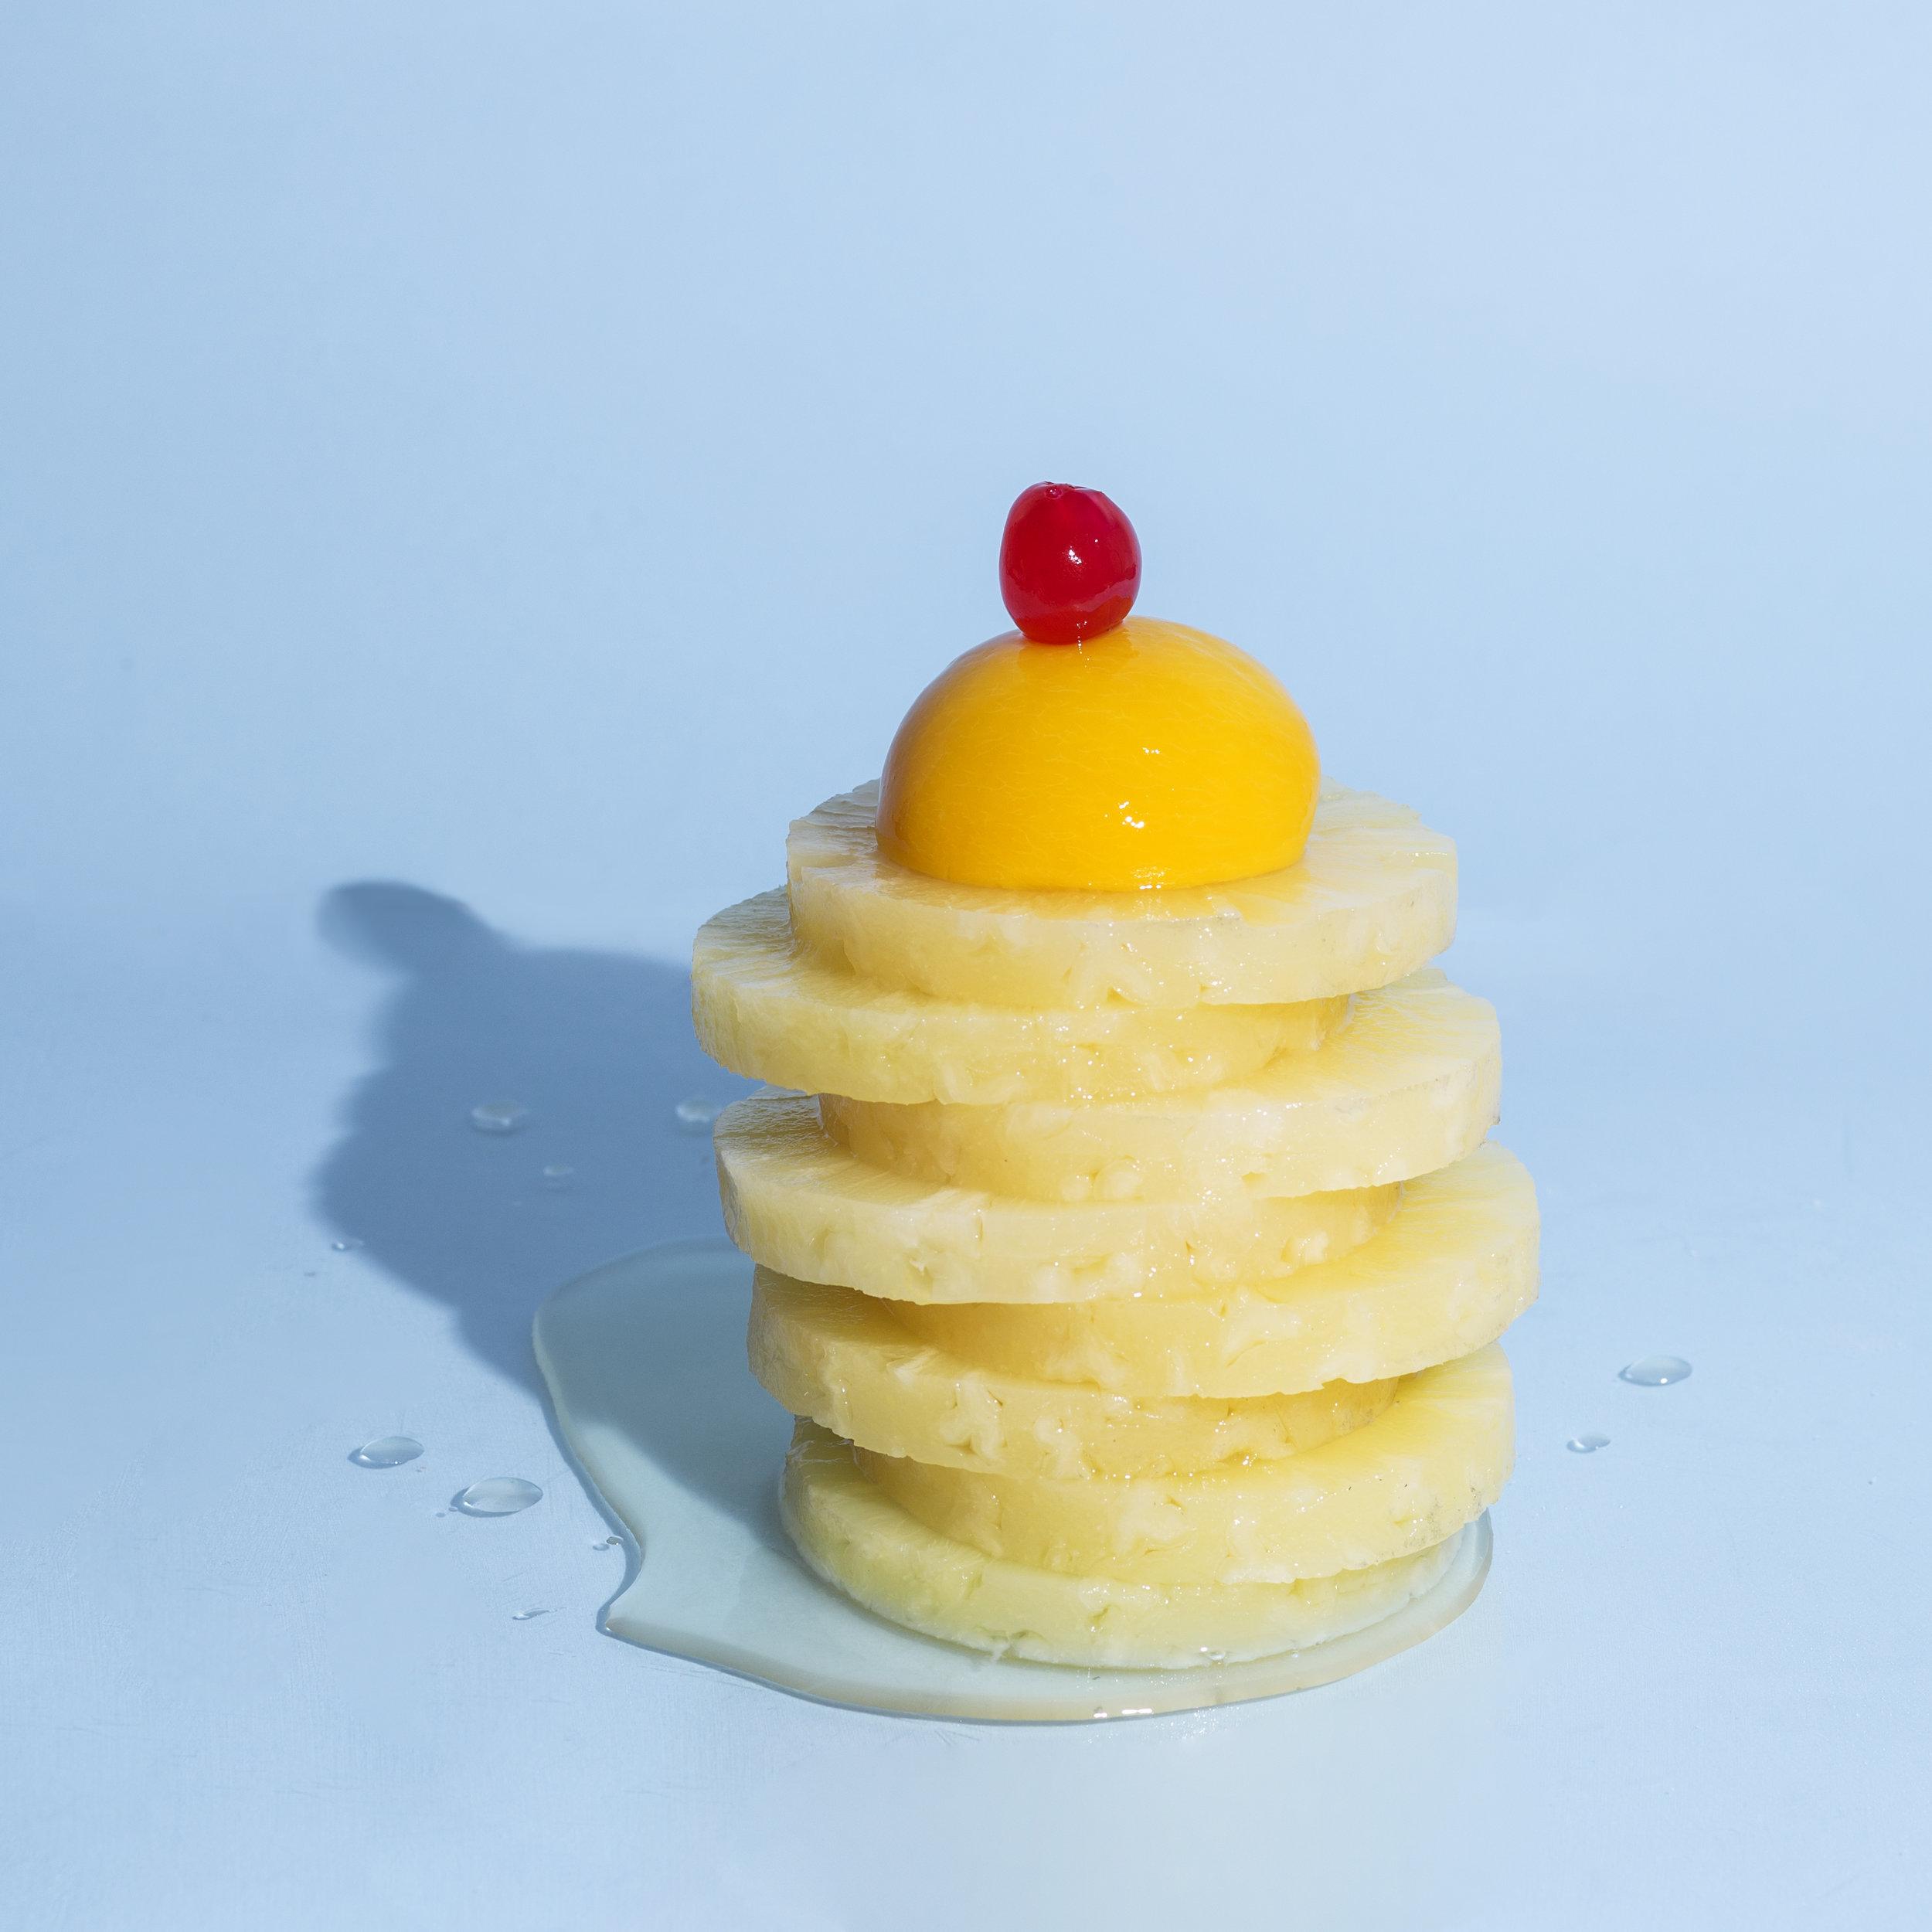 December 27th - Fruit Cake Day